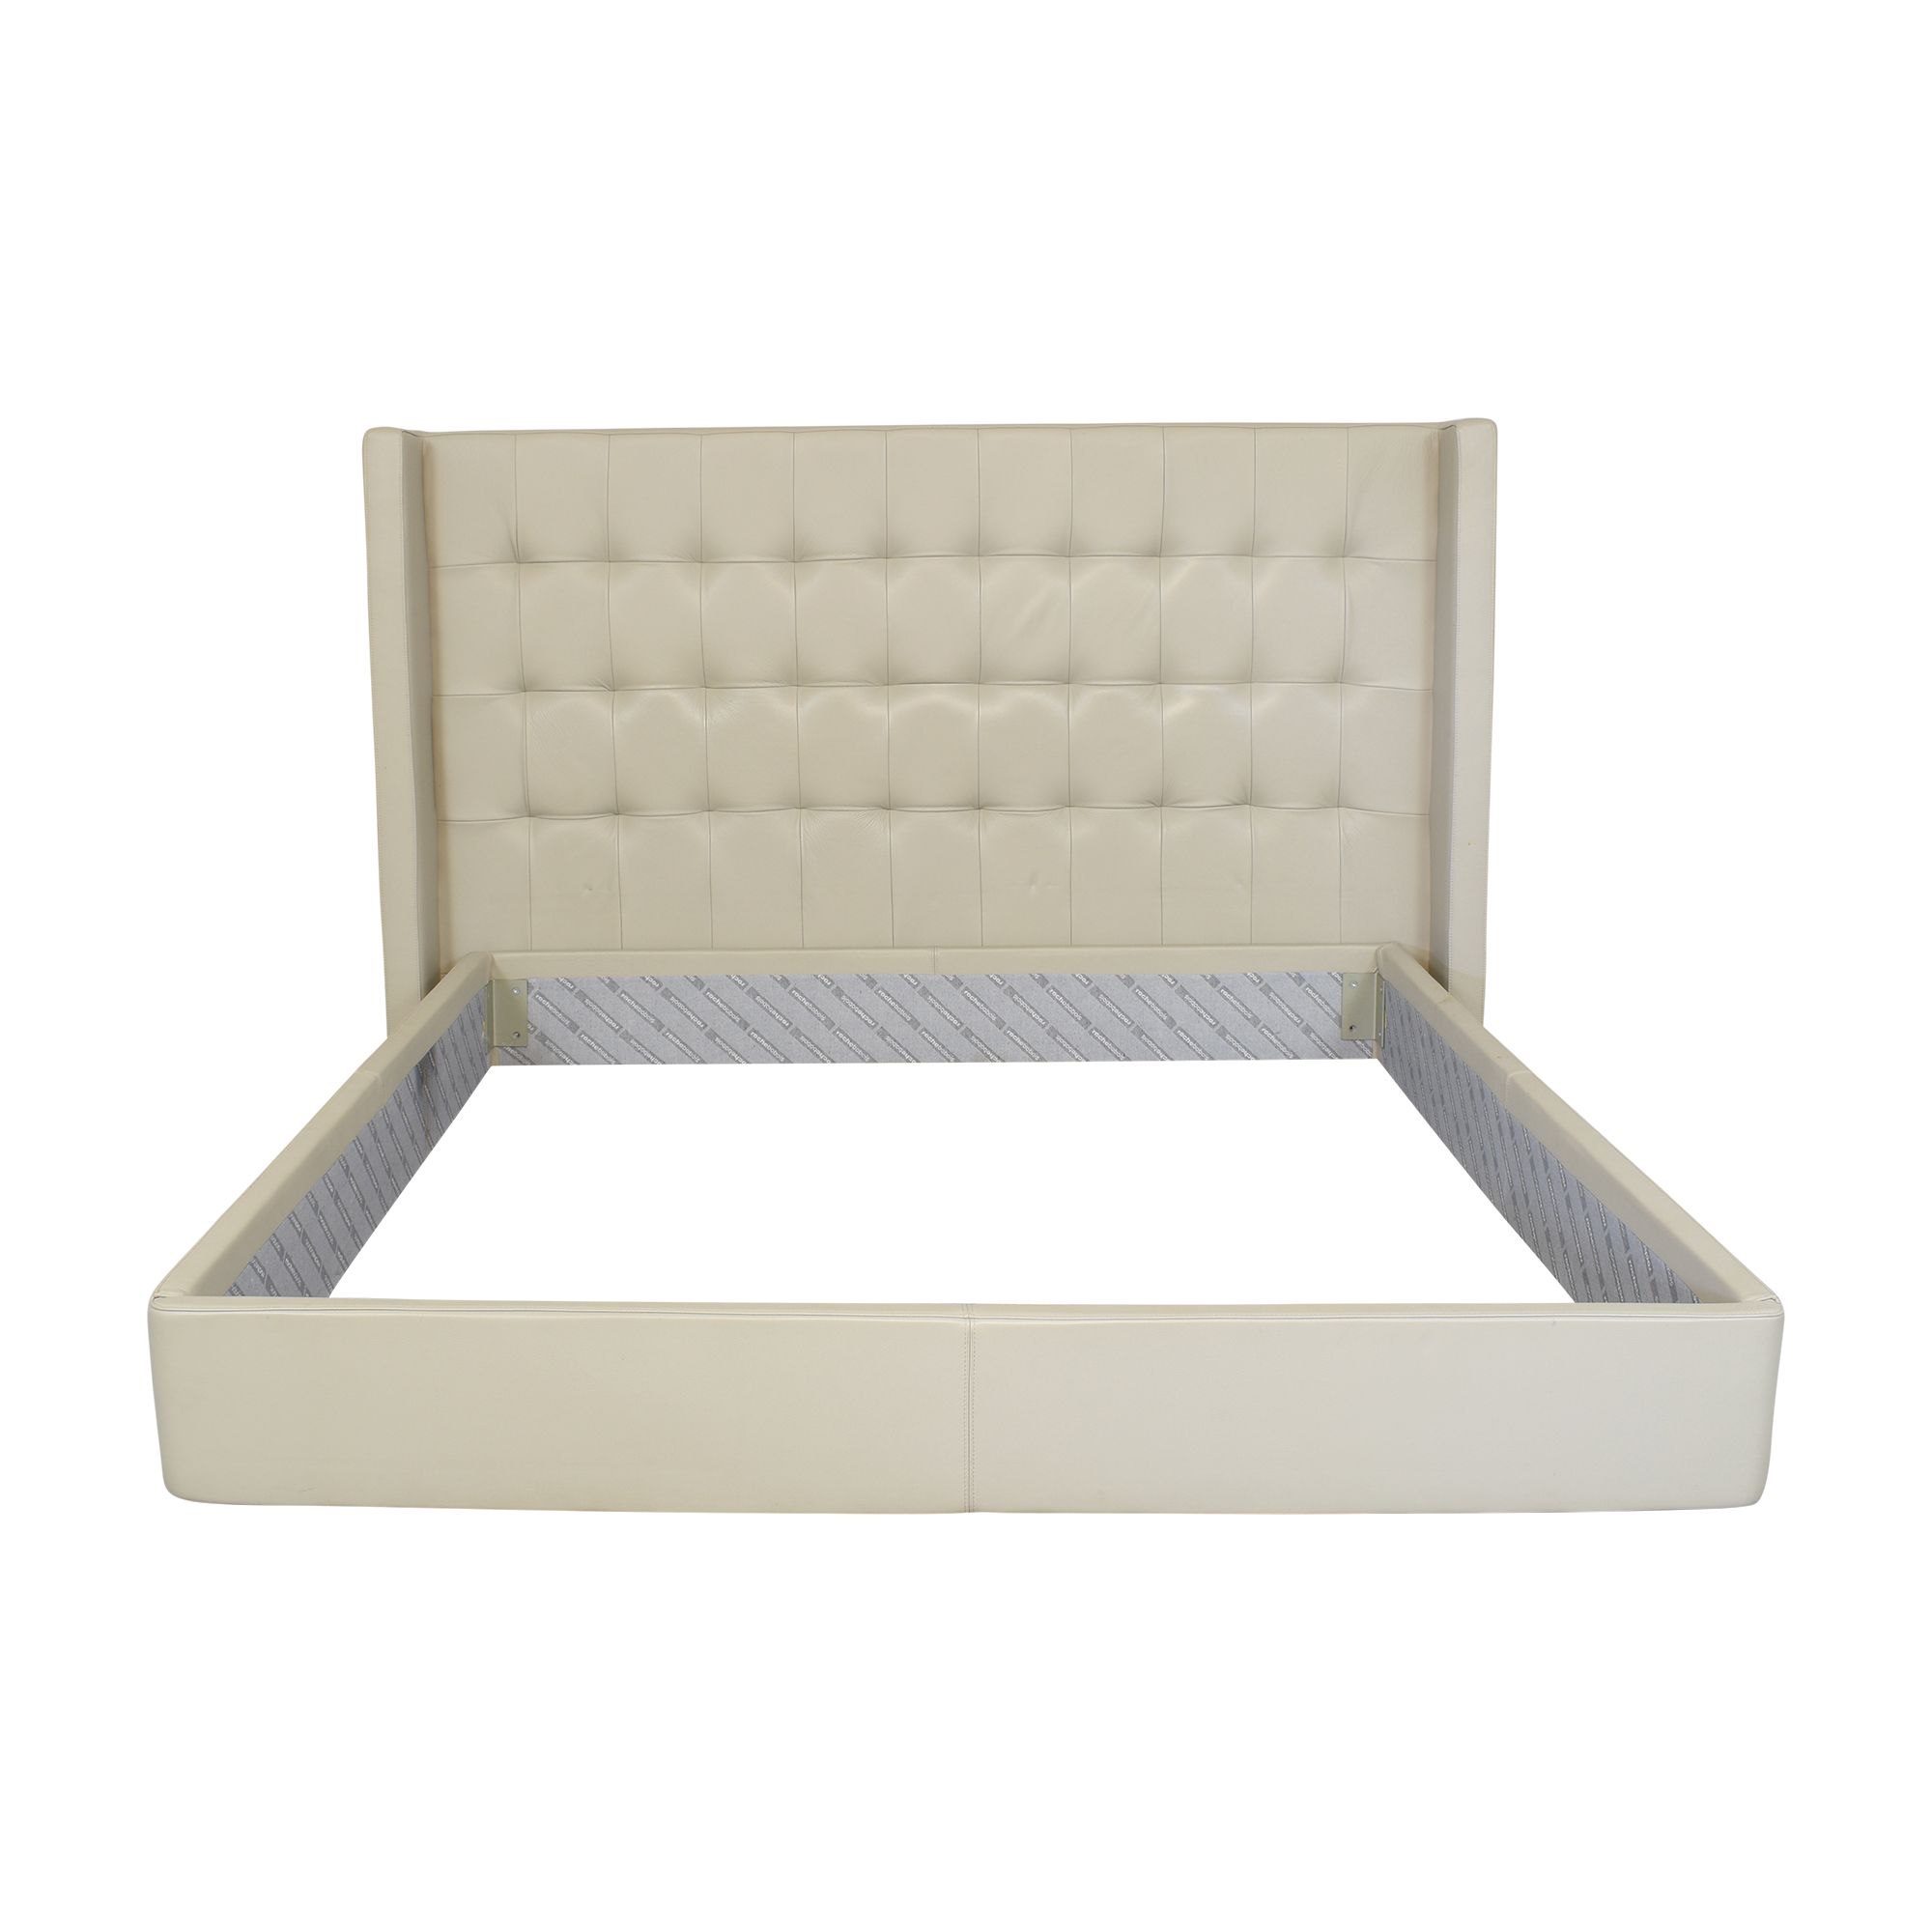 buy Roche Bobois Roche Bobois Tufted King Bed online